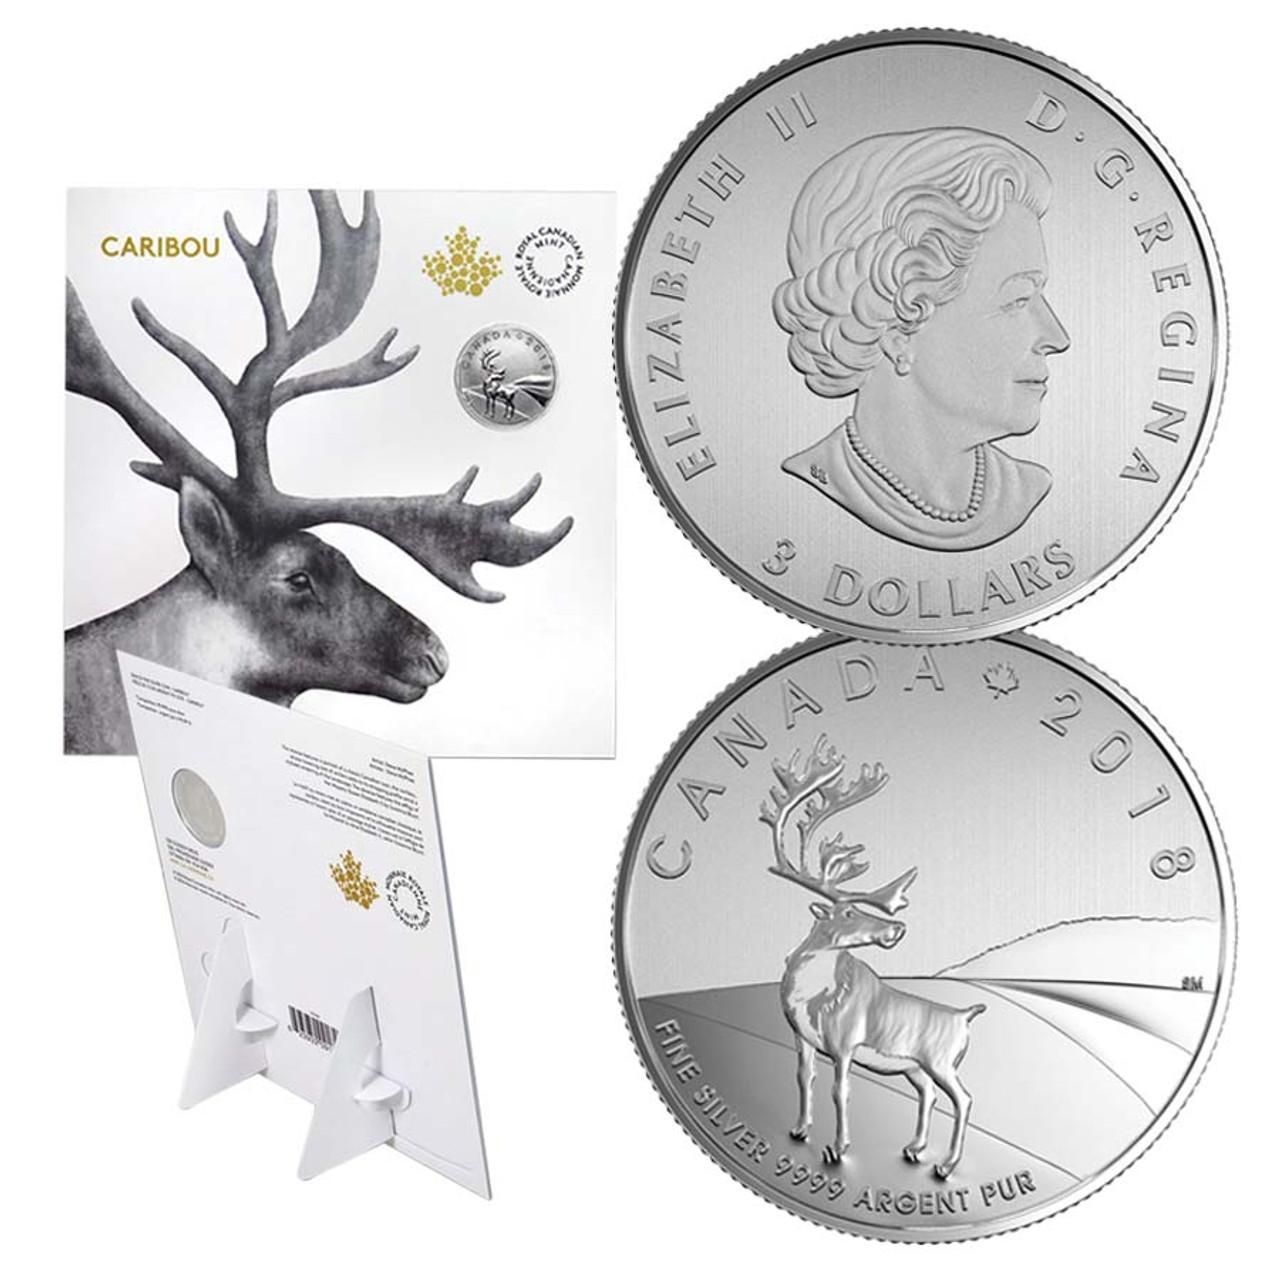 Canada 2018 Caribou 1/4 Oz. $3 Silver